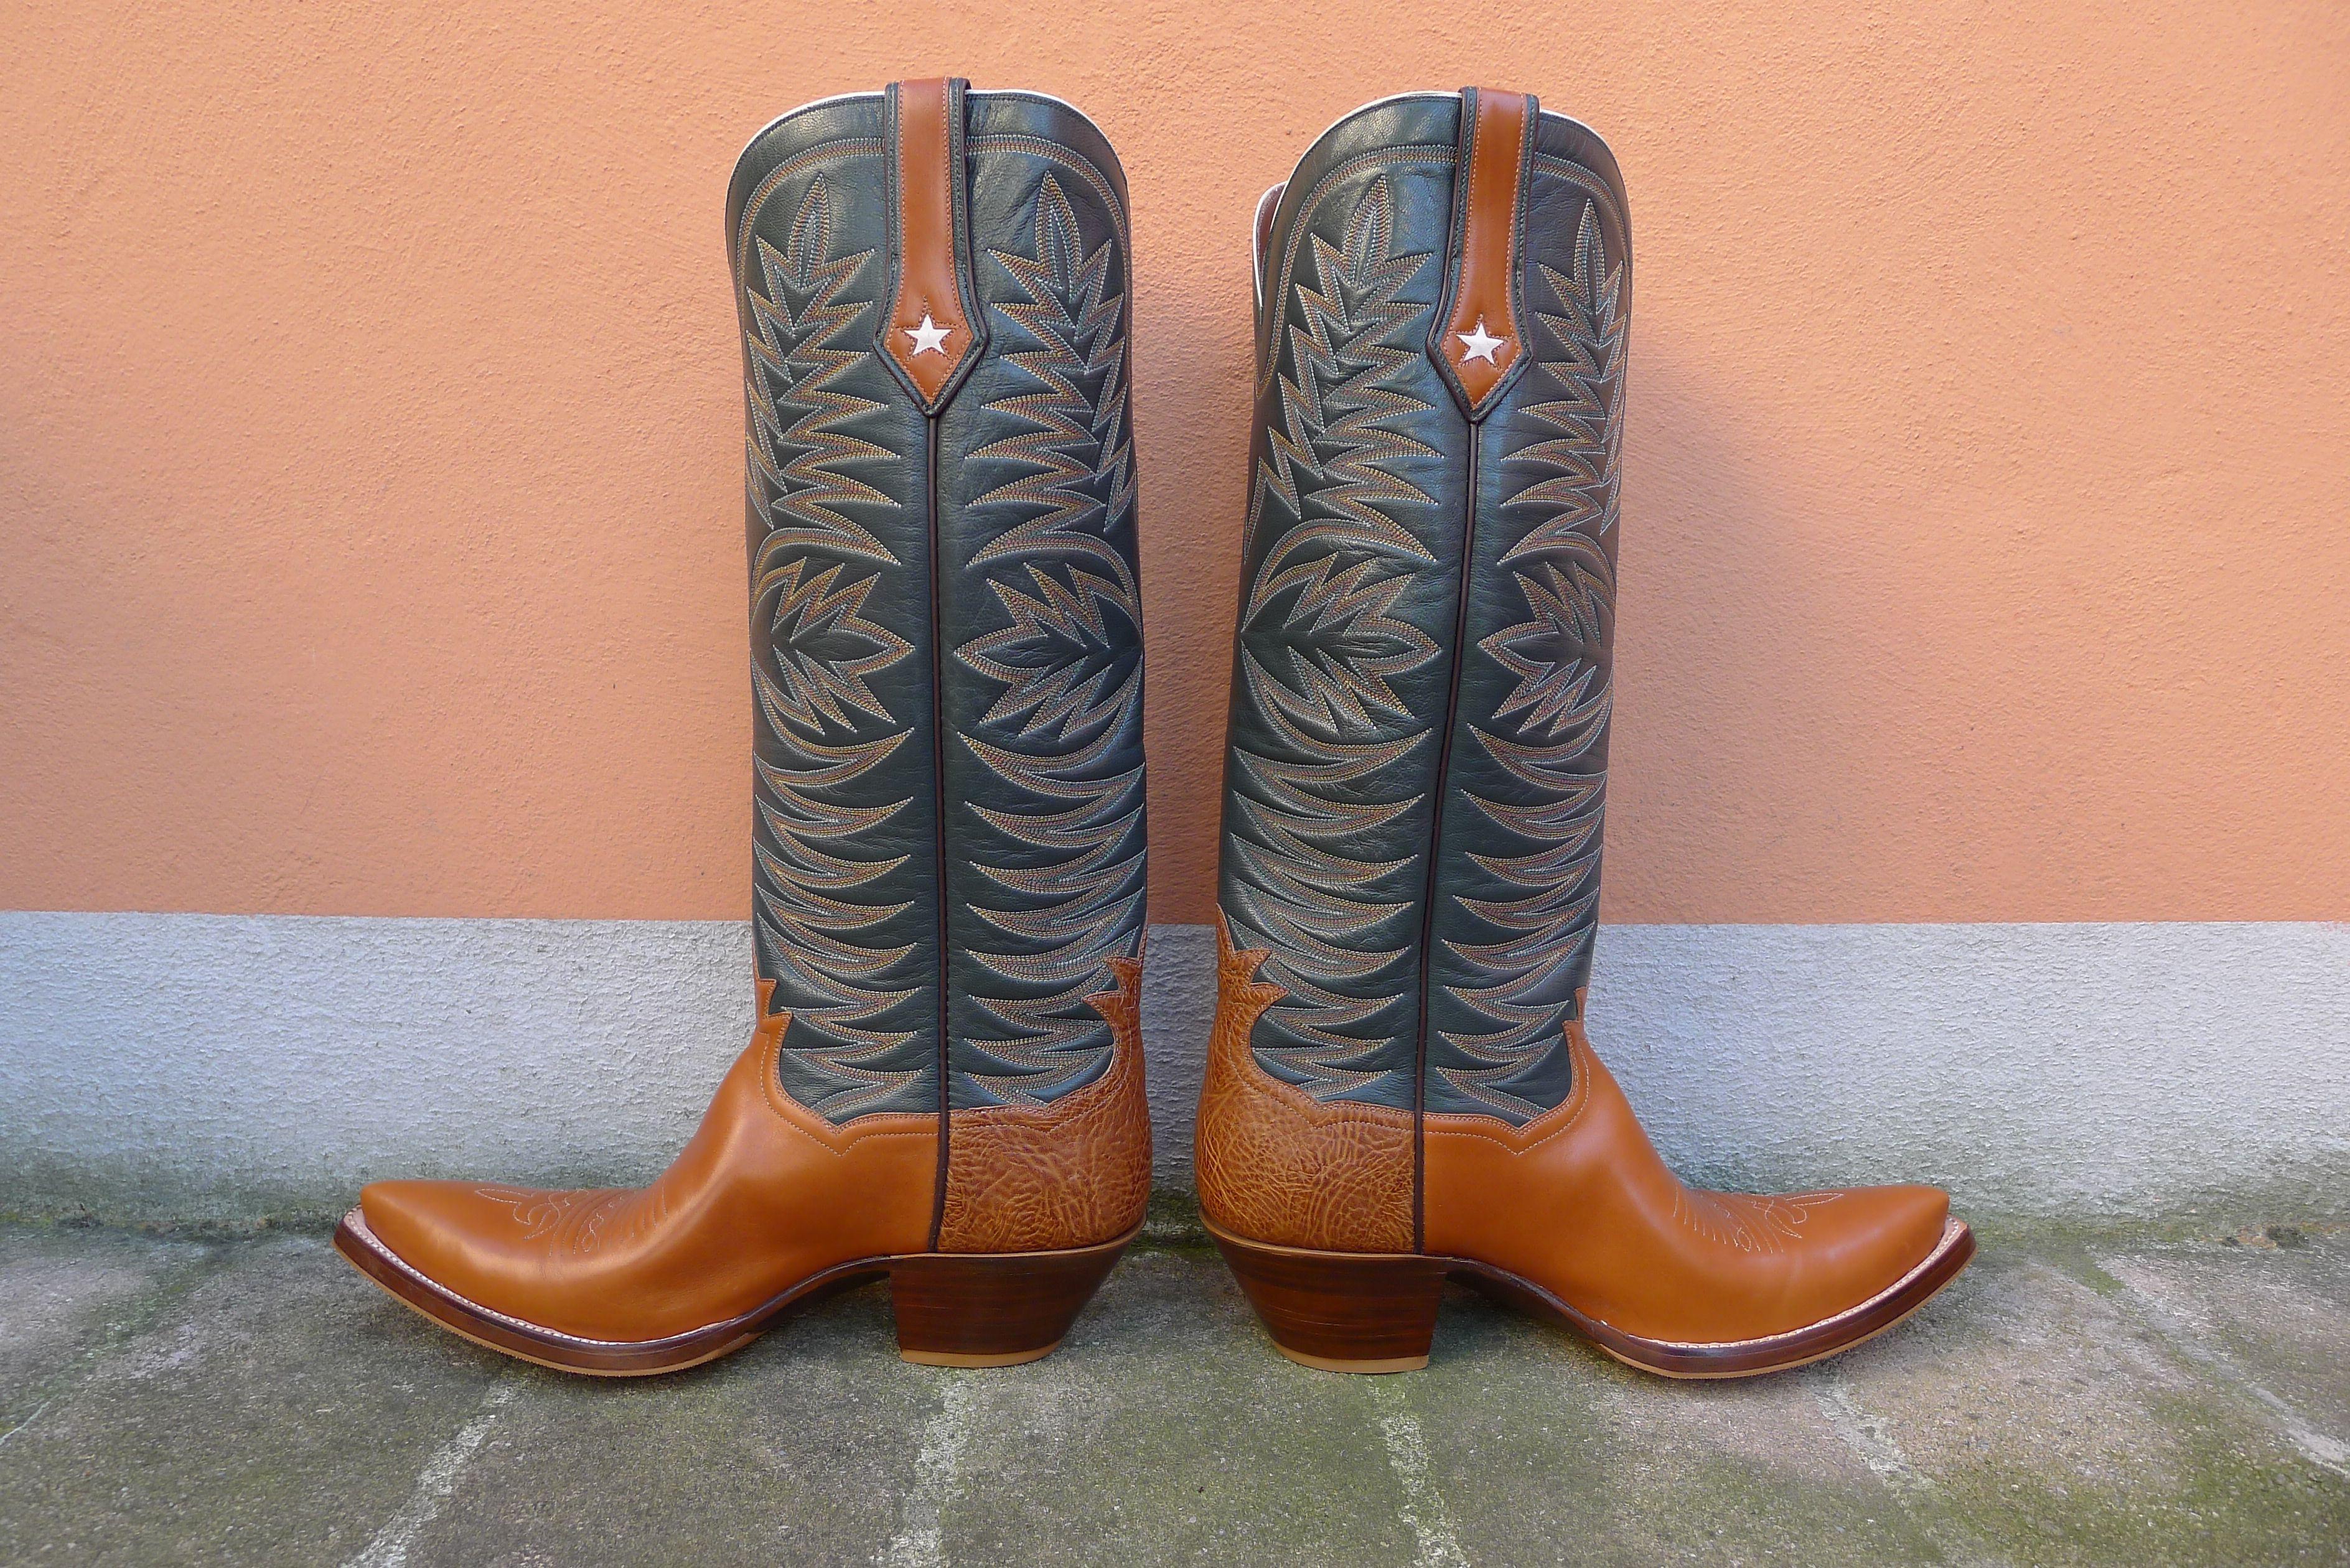 Cowboy Bootshandmade Legendary Boot Paso Custom by CoEl LUMVpSGqzj